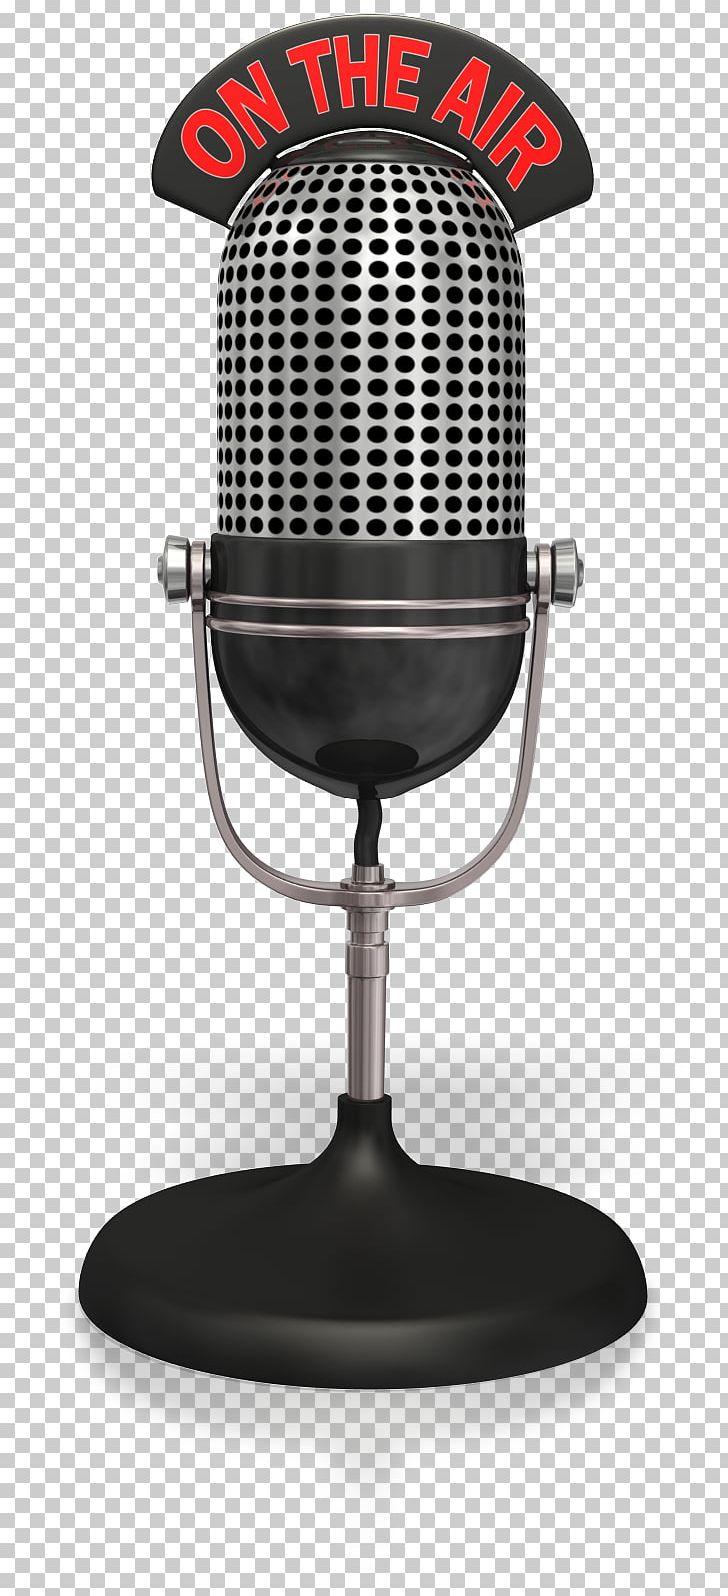 medium resolution of wireless microphone golden age of radio png clipart antique radio audio audio equipment broadcasting